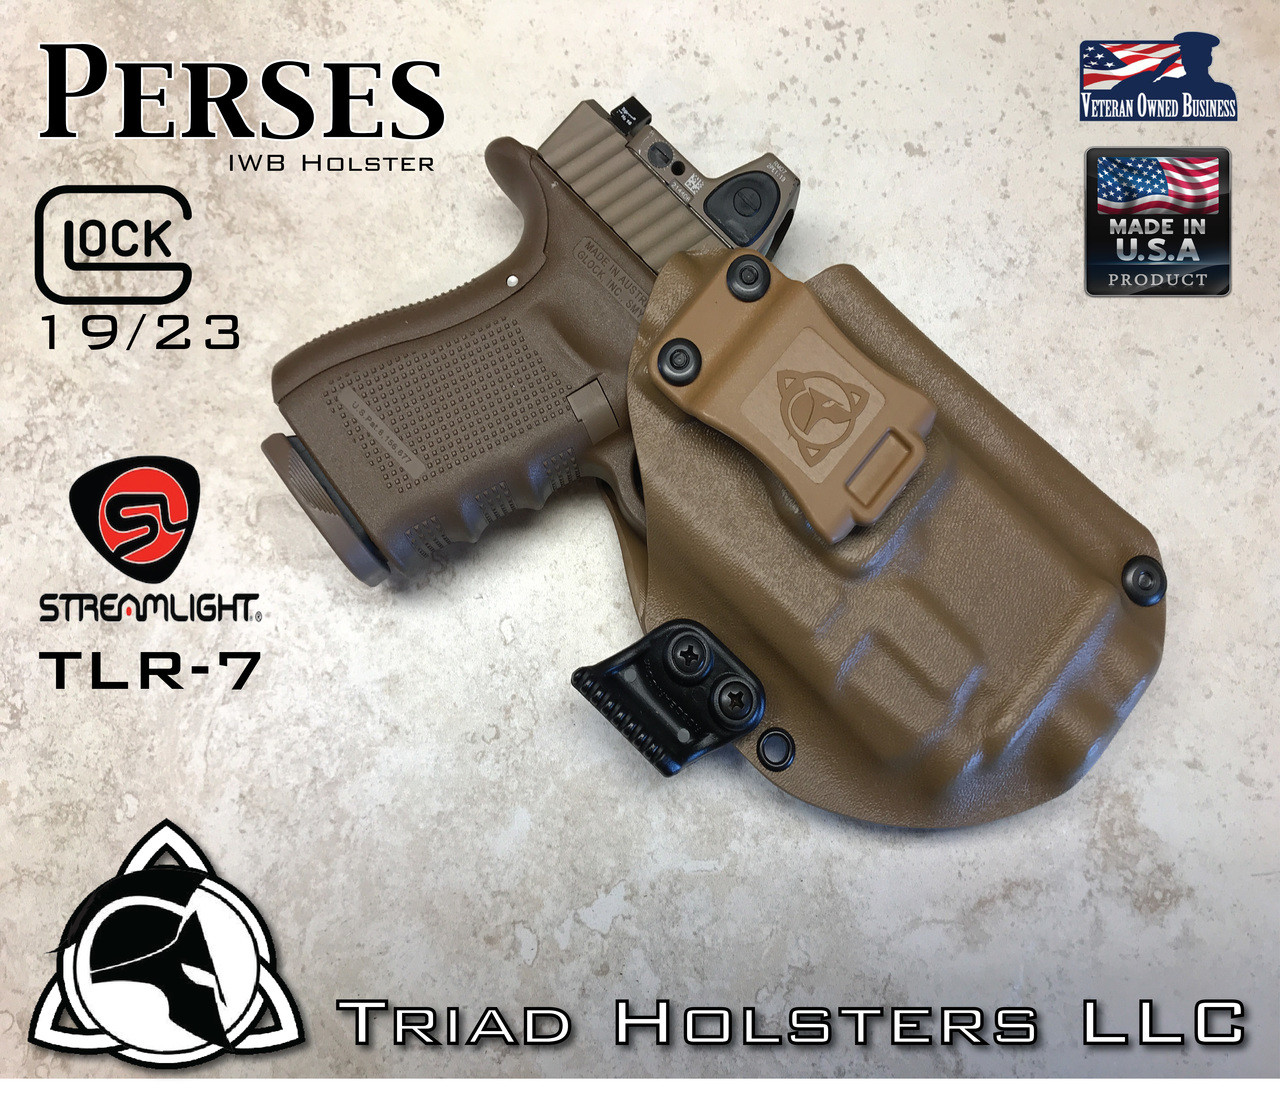 OD Green Kydex IWB Holster for Glock 19 23 32 RMR Cut Threaded Barrel TLR-7